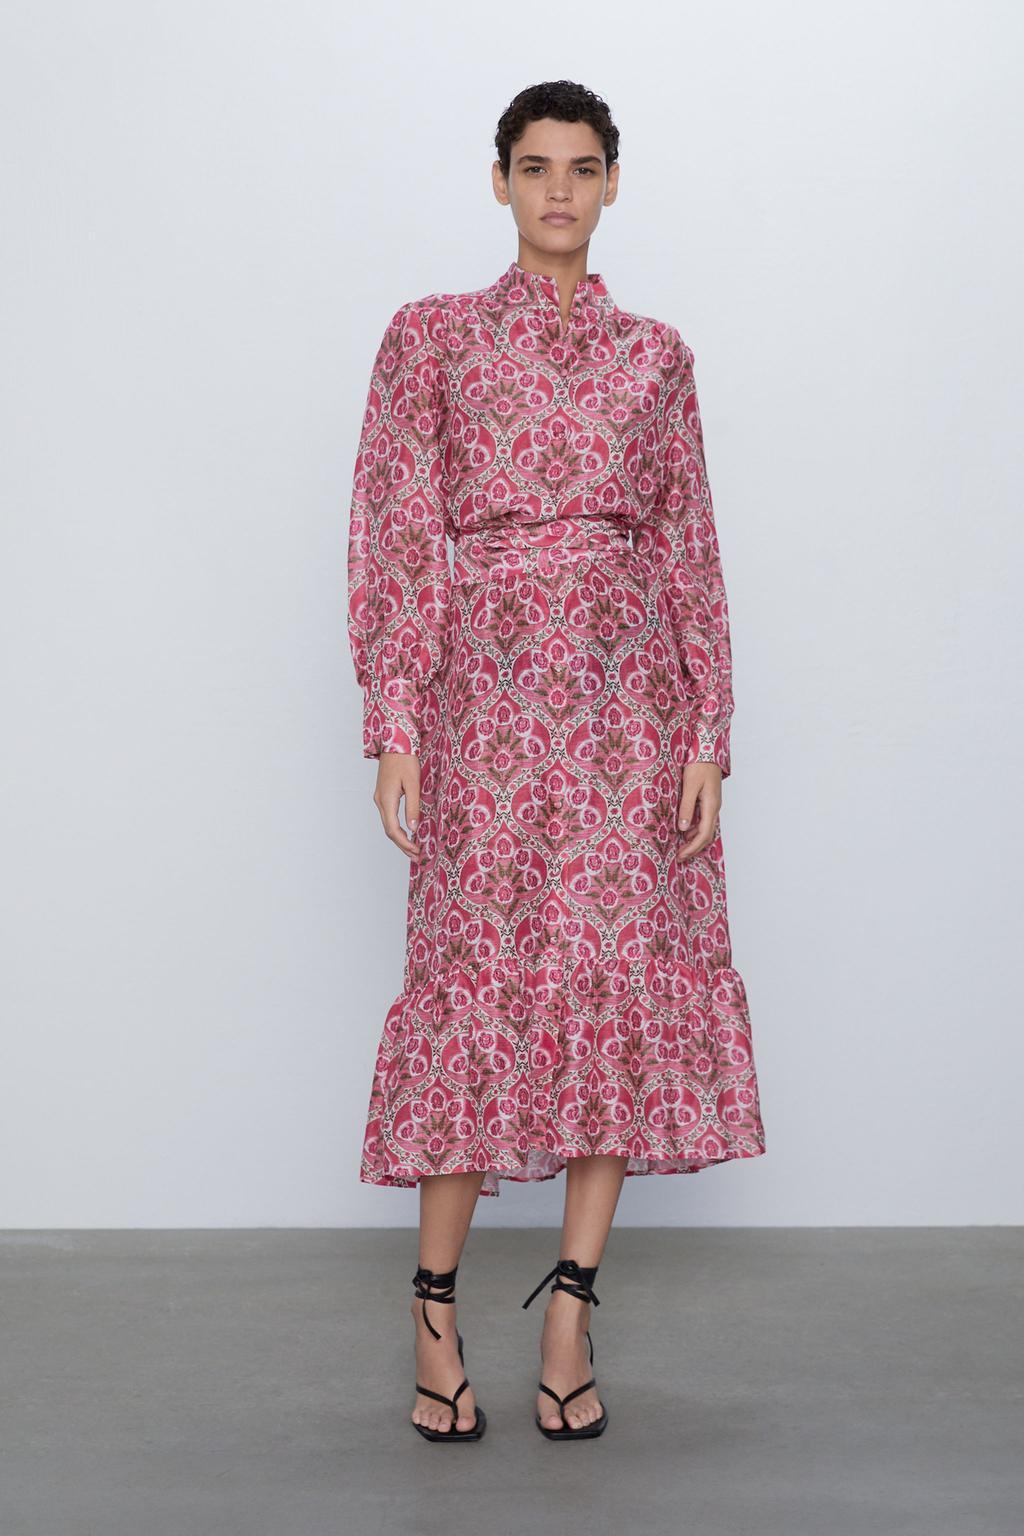 2020 New Spring Summer New Style European Printed Female Midi Dress Printed Zaraing Vadiming Sheining Women Dress